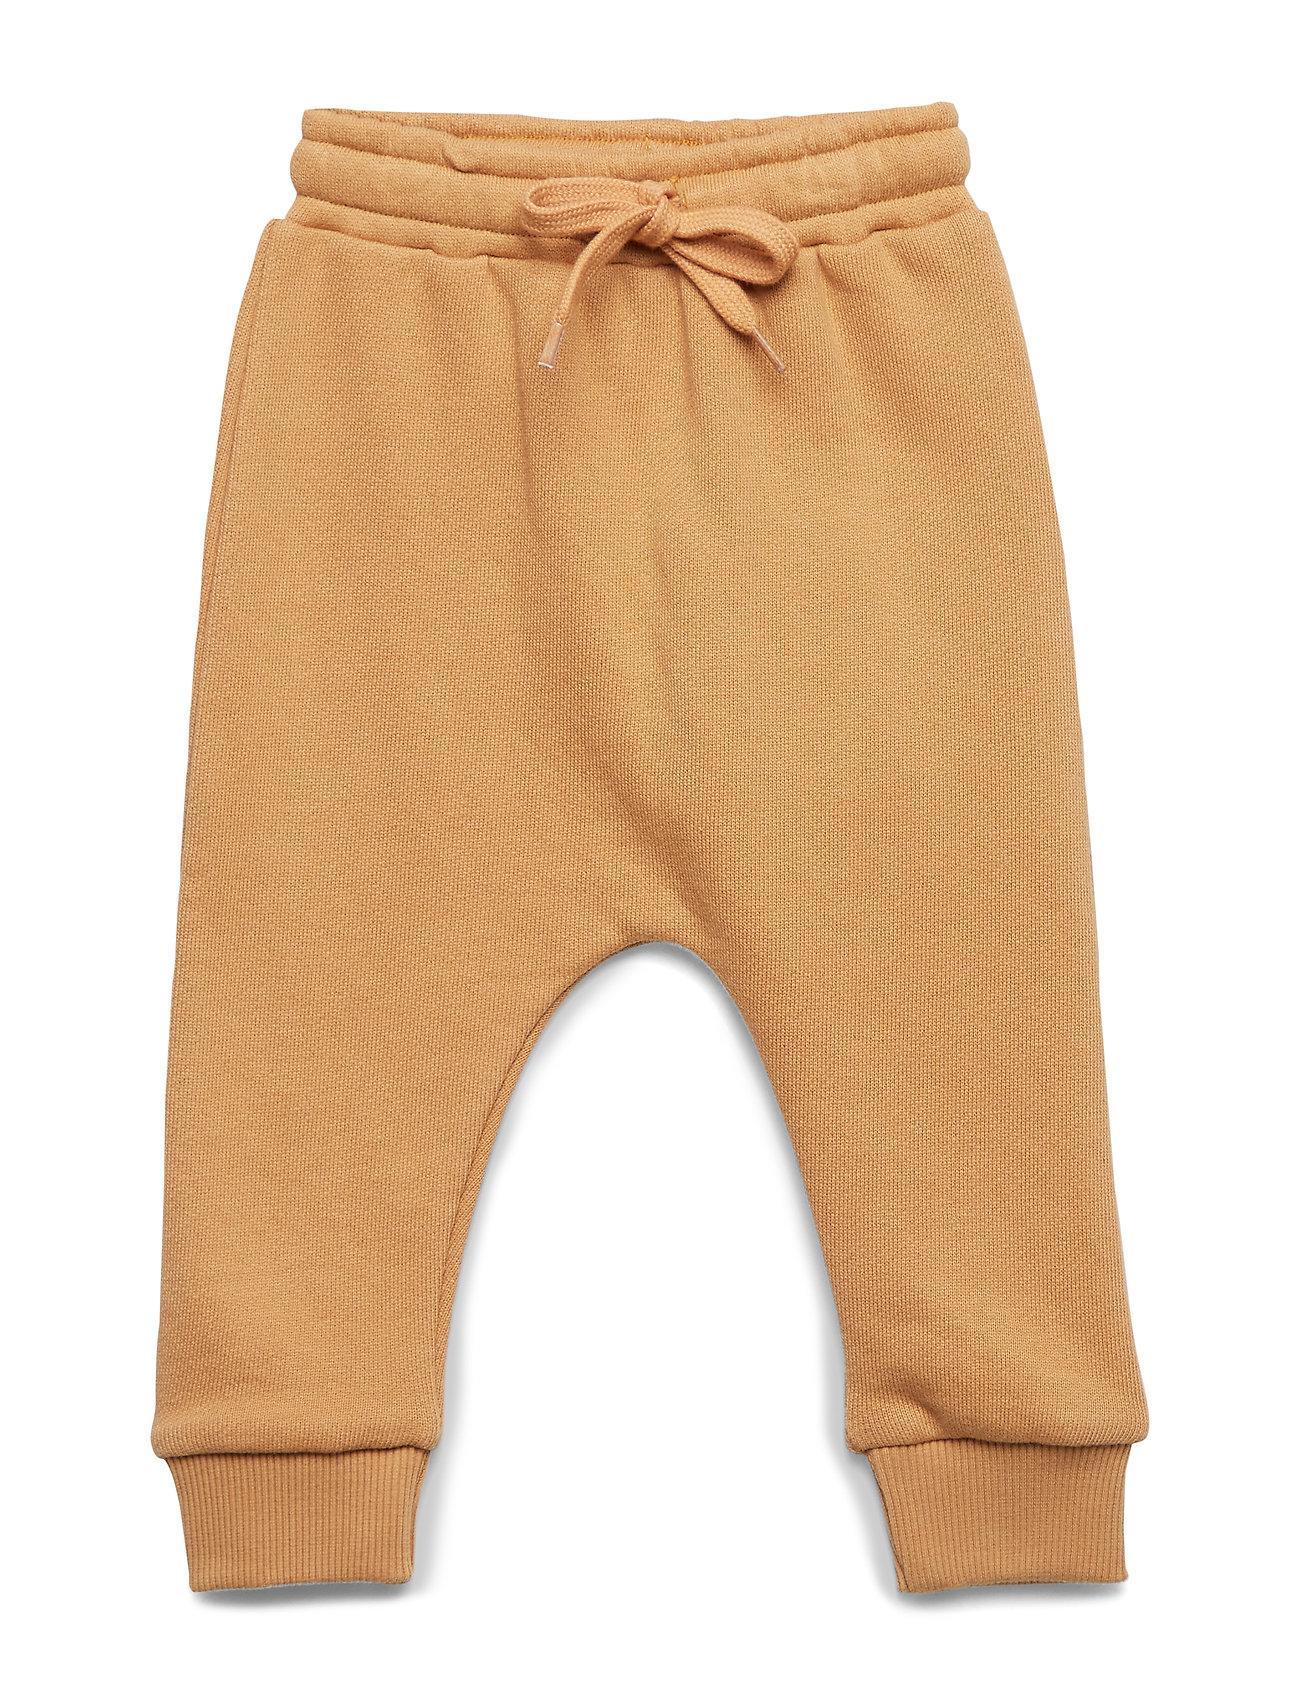 Soft Gallery Meo Pants - DOE